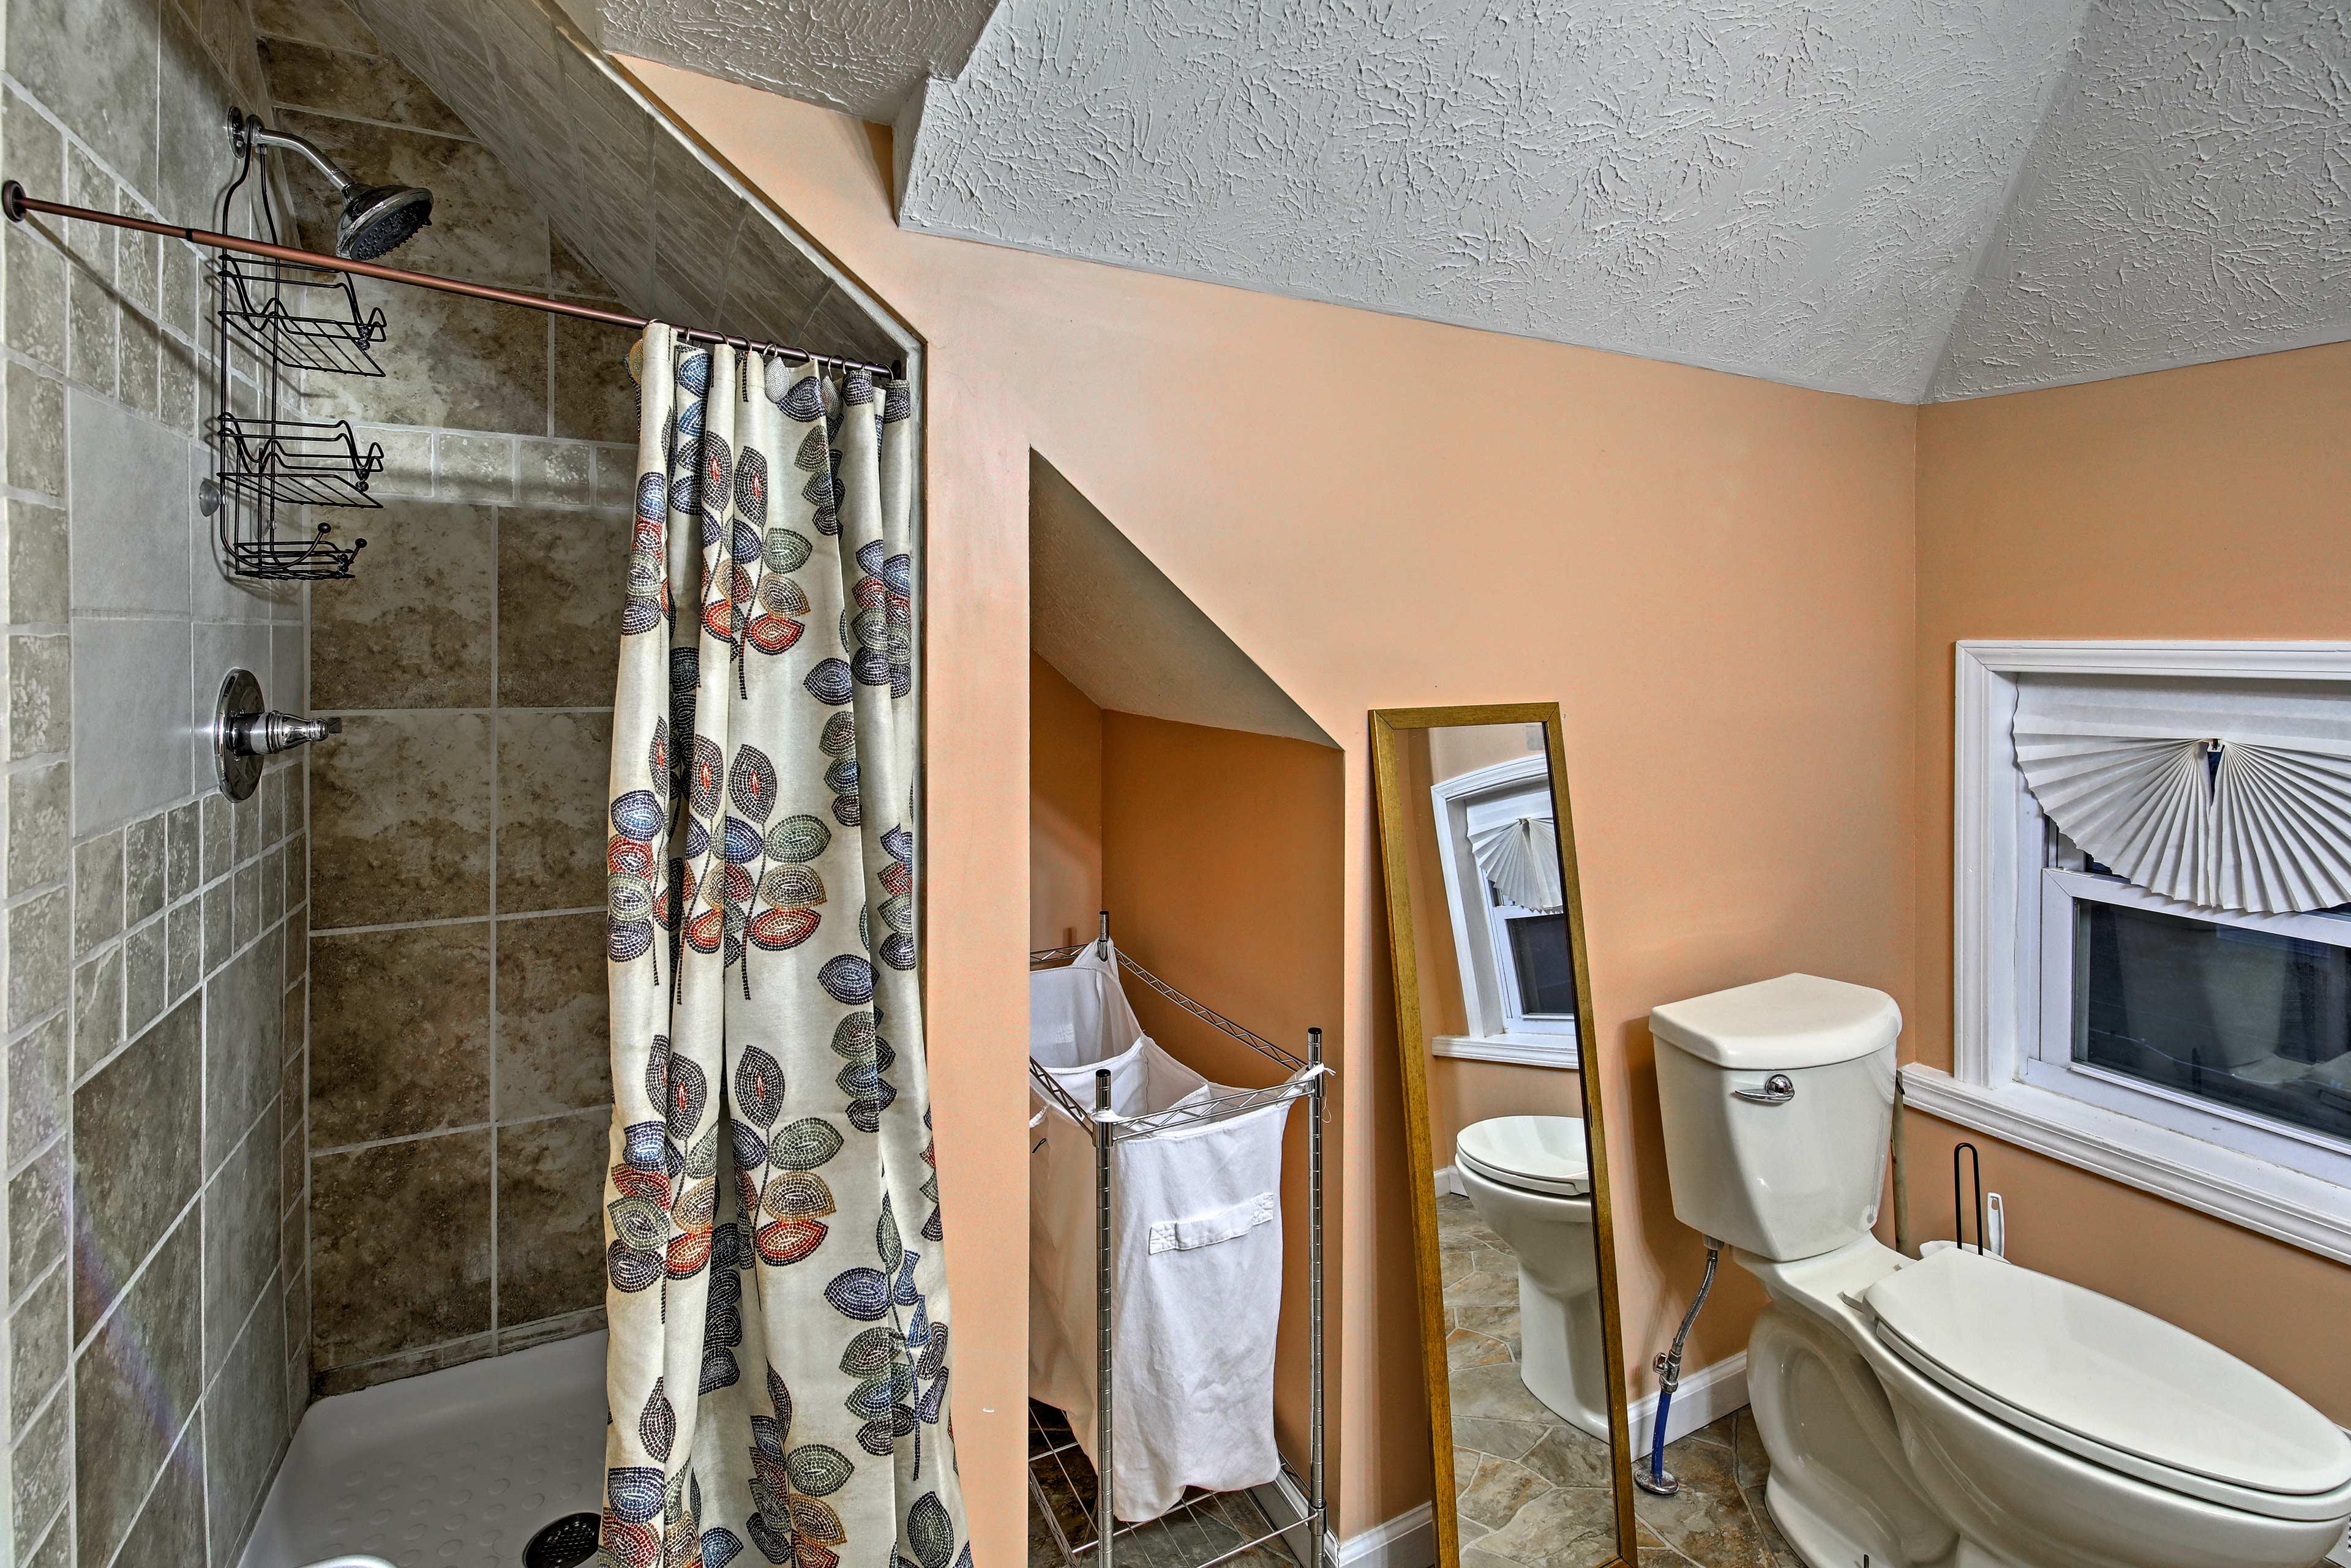 The upstairs bedroom has an en-suite bath.